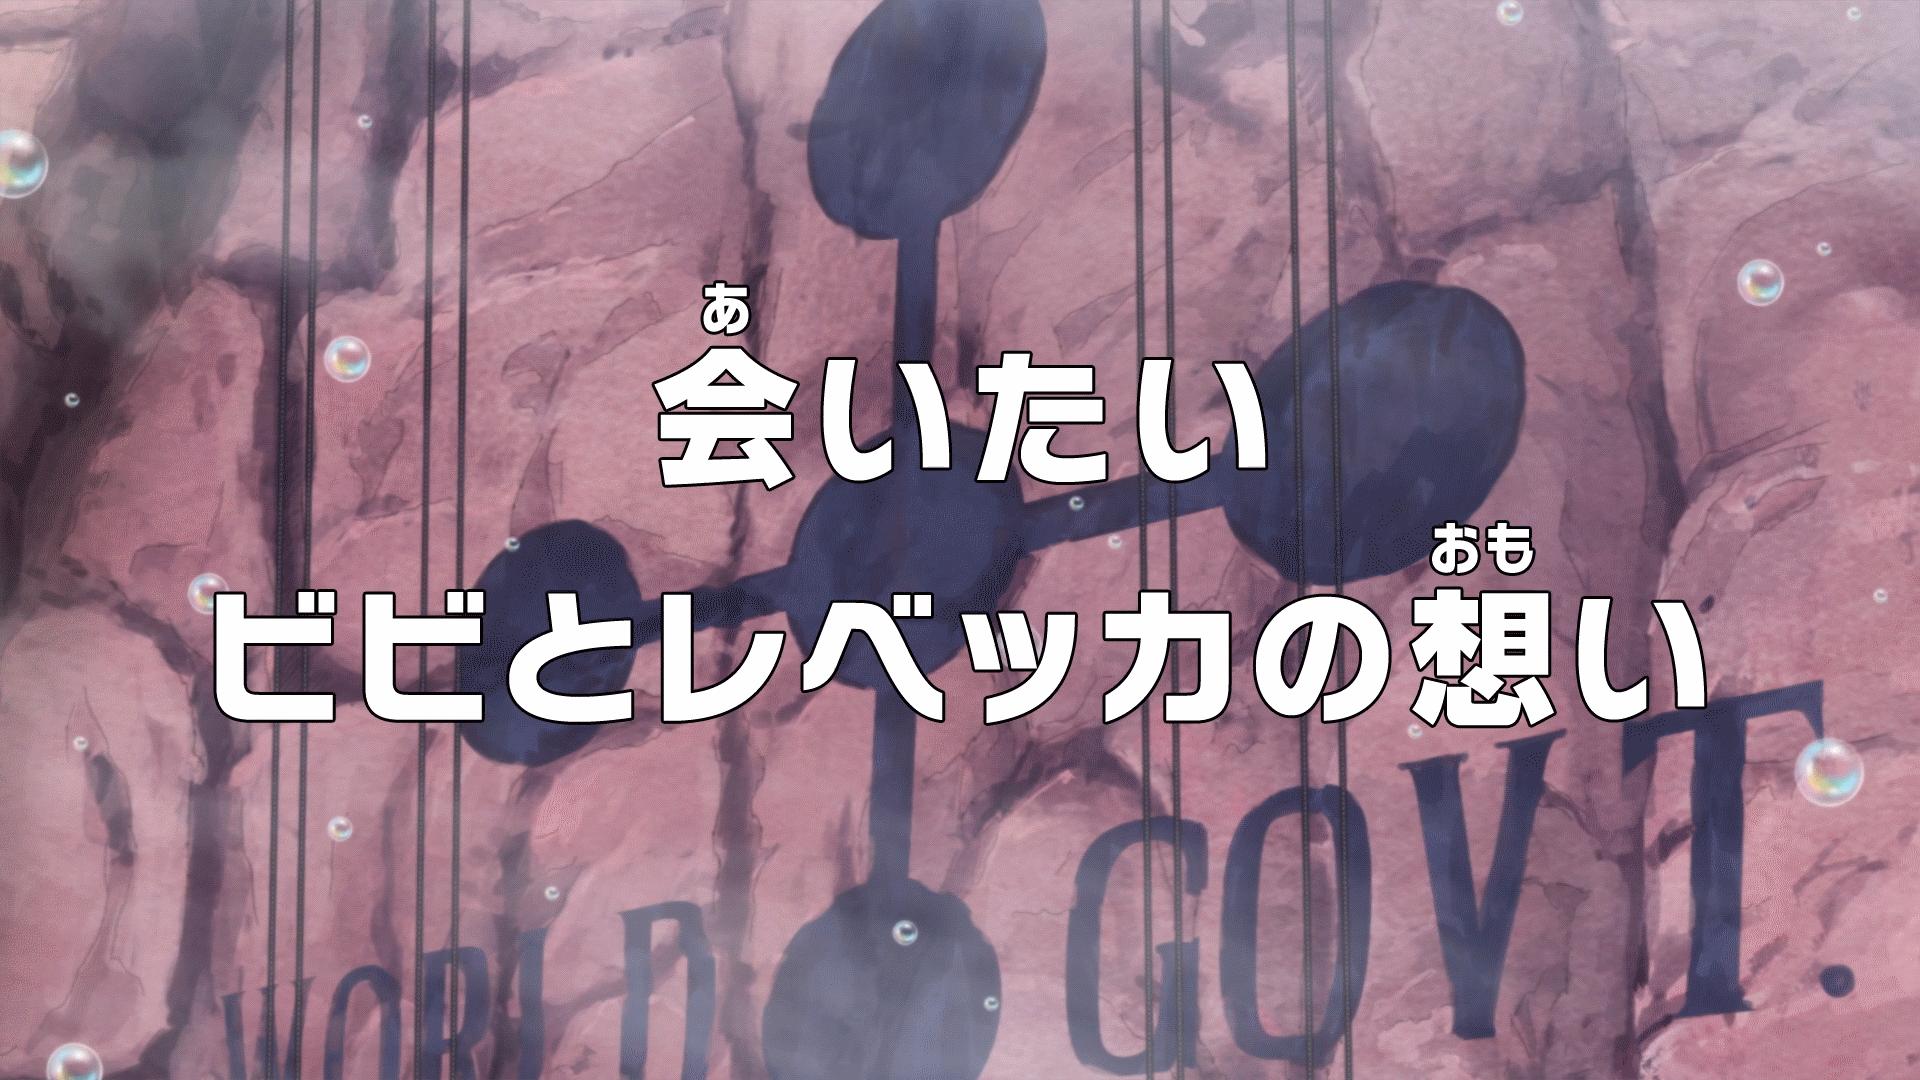 Episode 884